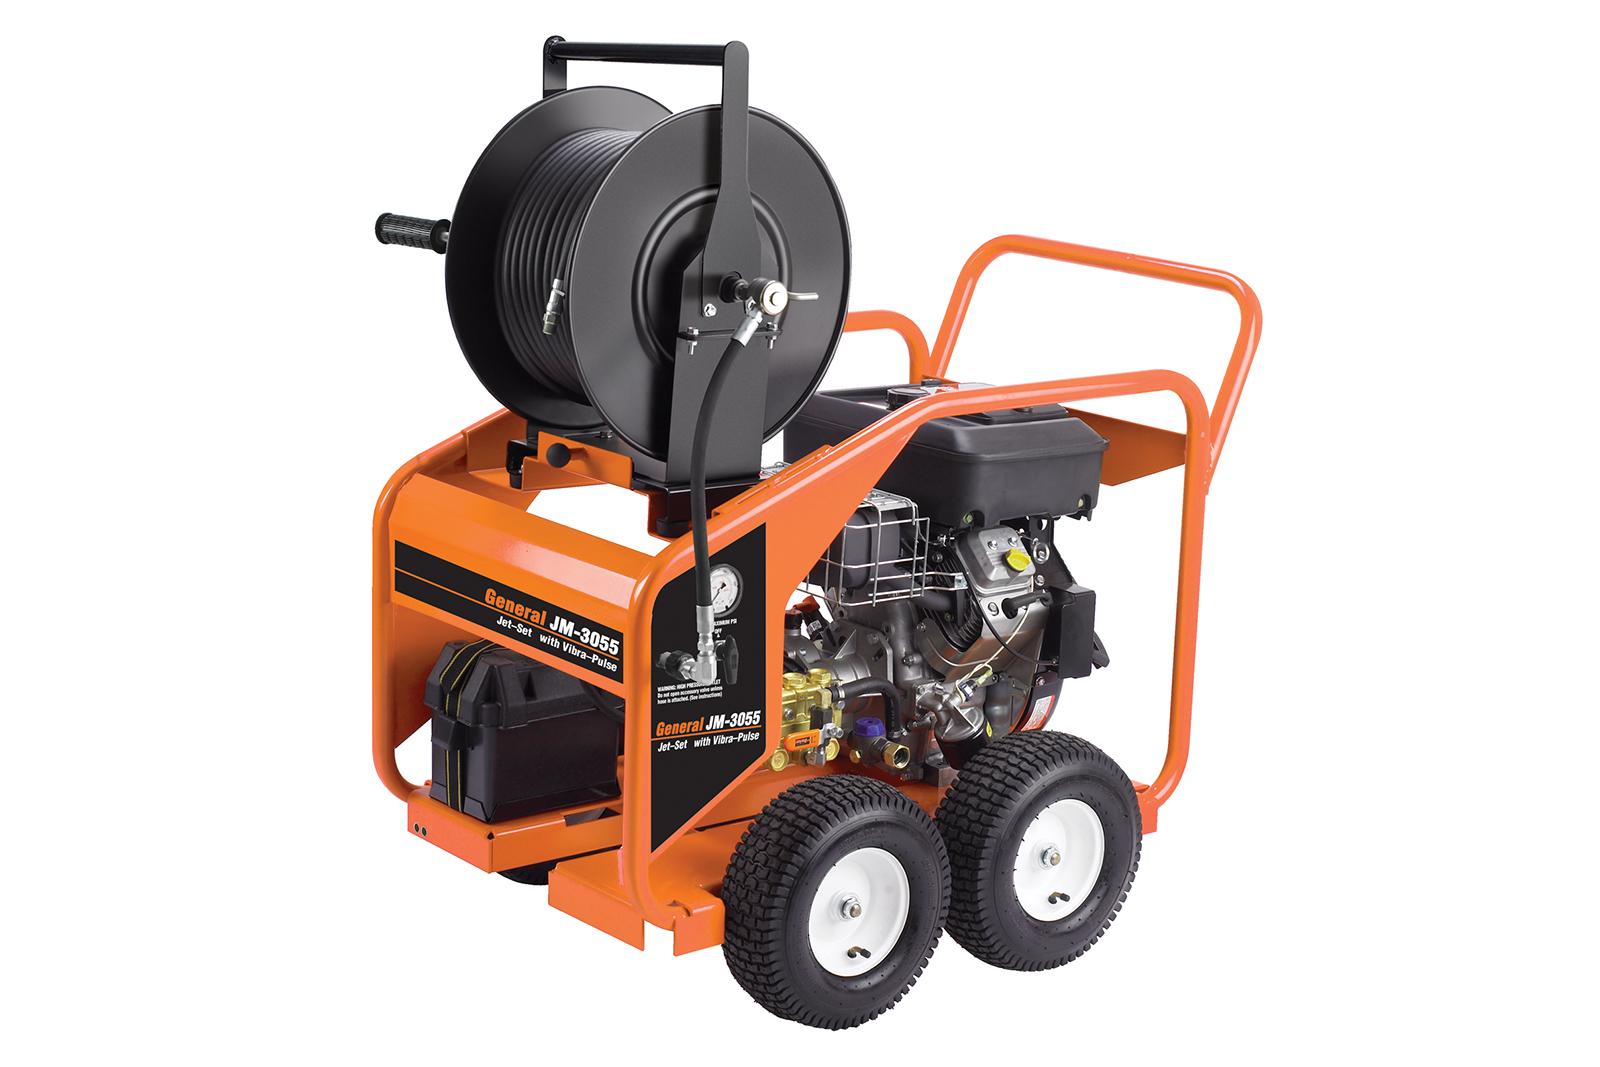 Прочистная машина General pipe Jm-3055-a цена